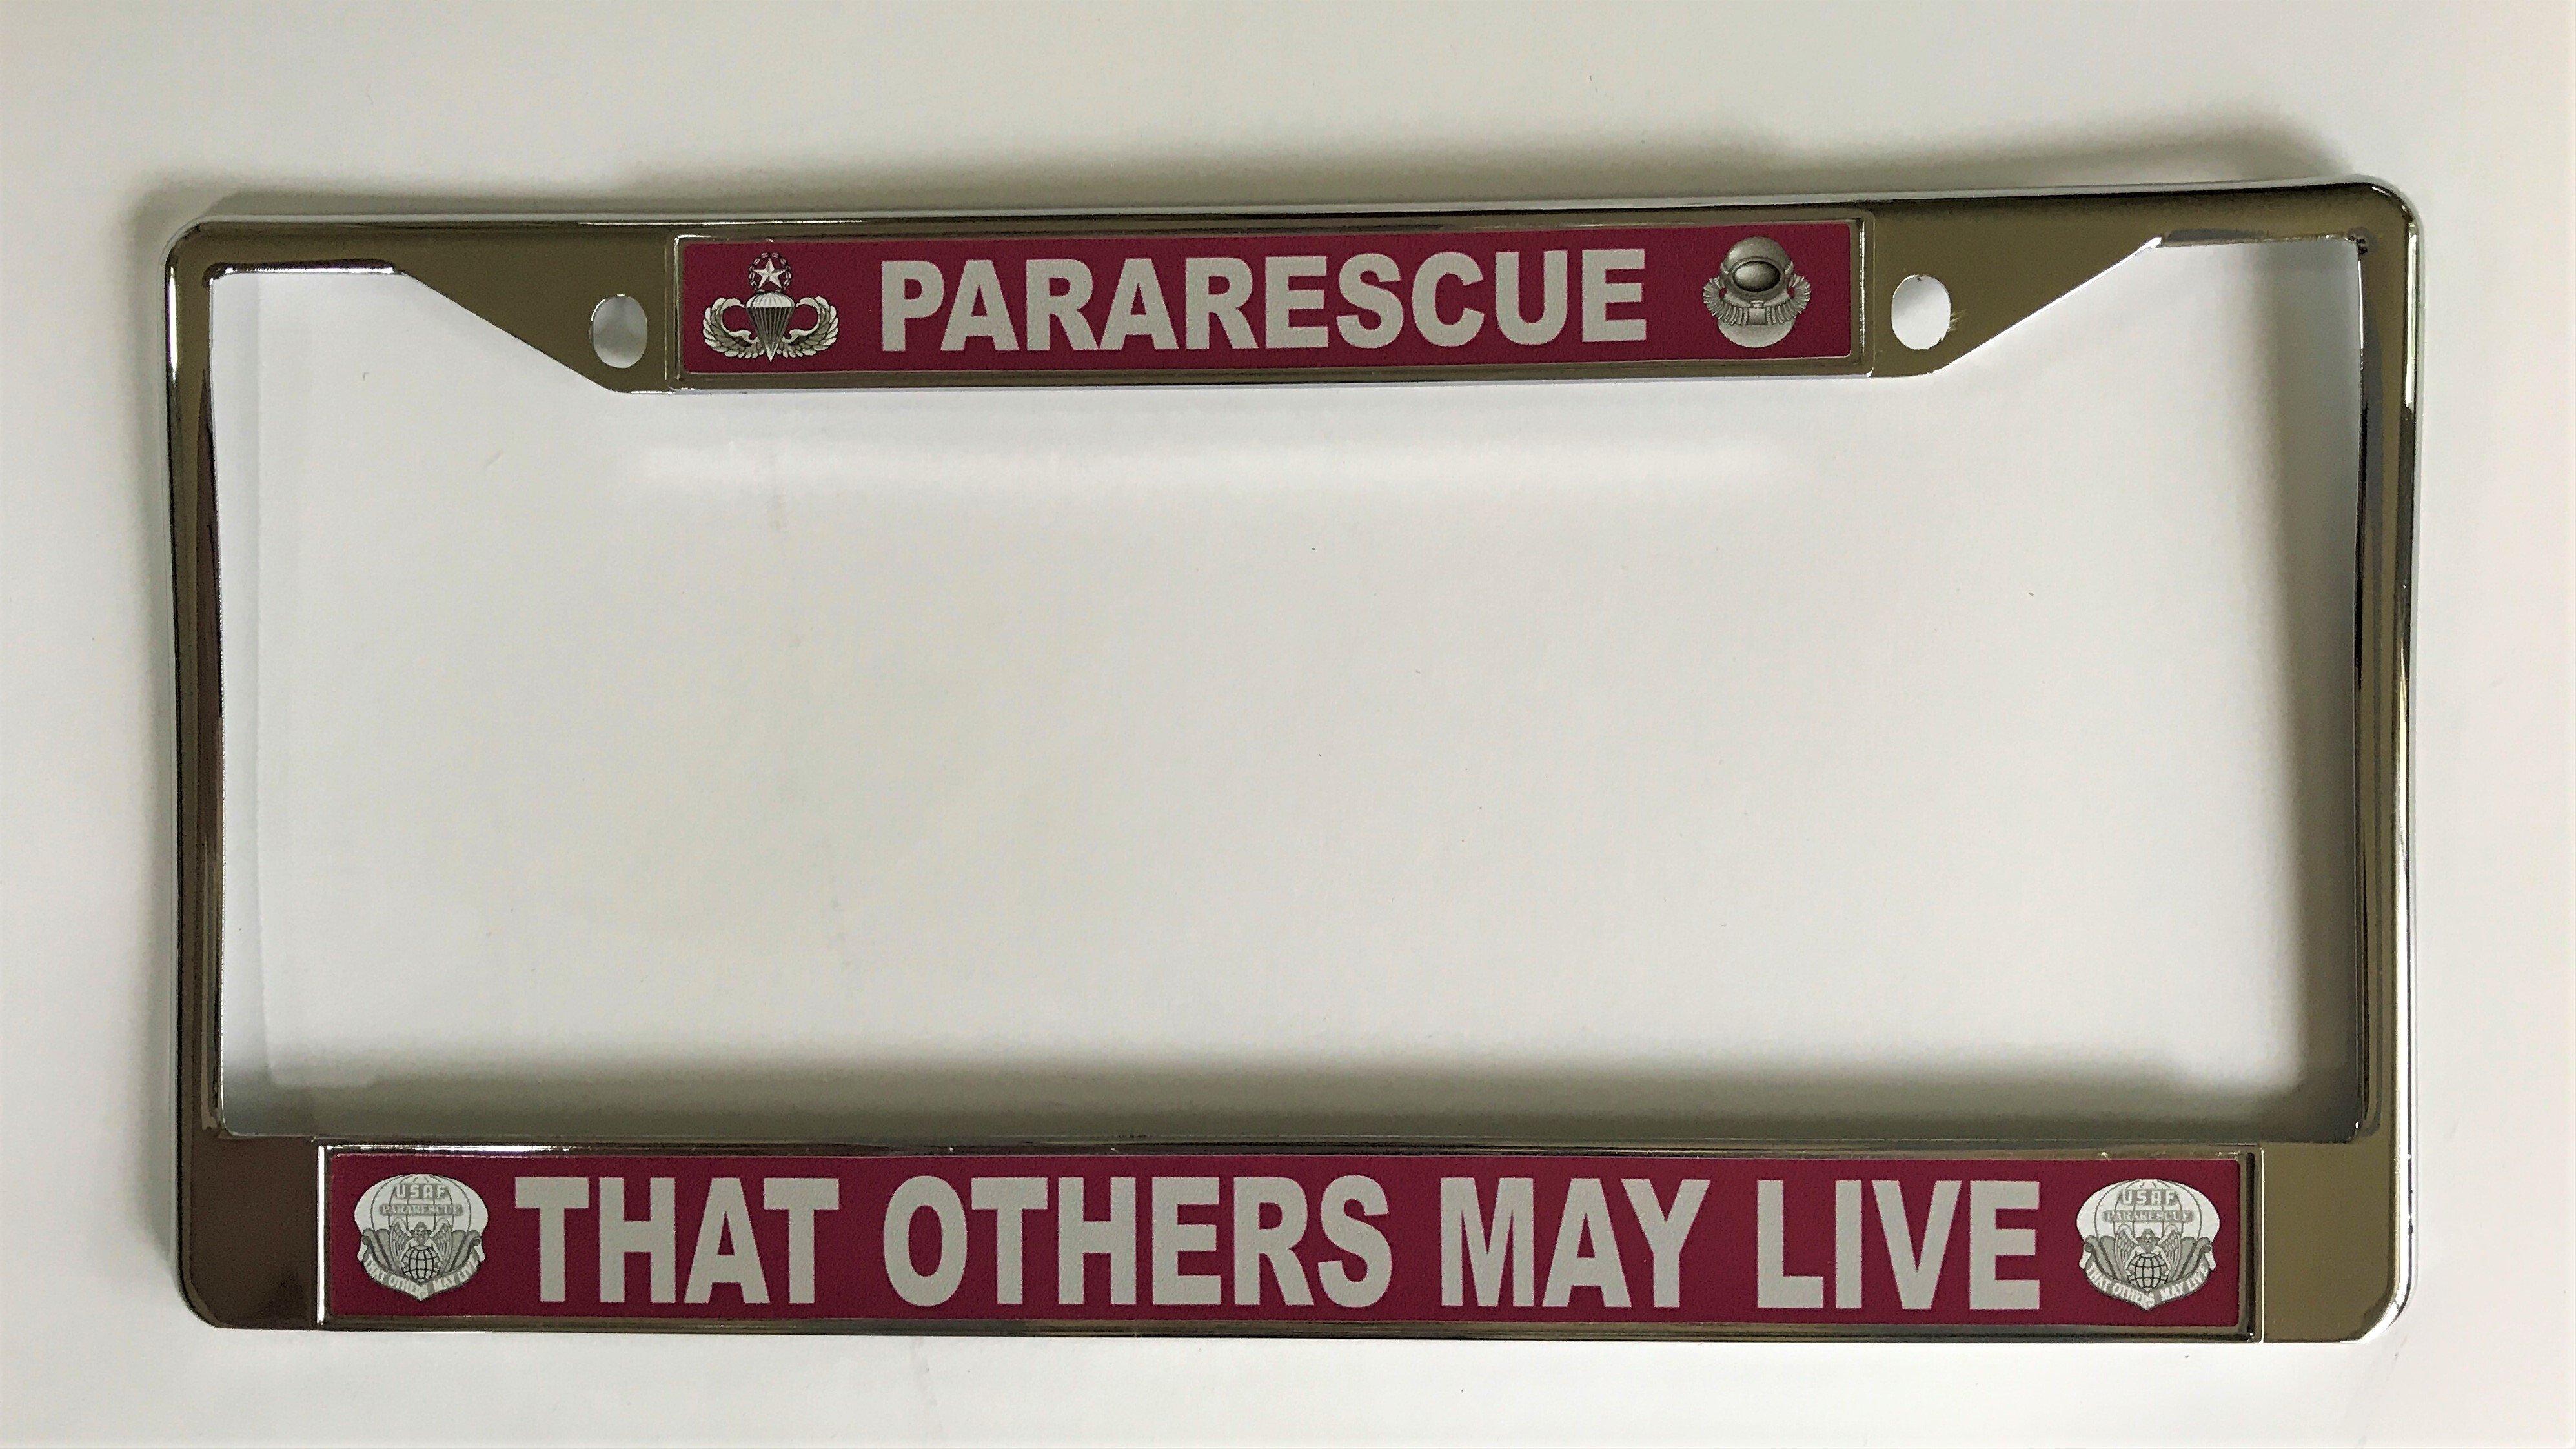 pja/ Pararescue License Plate Frame 01-0016